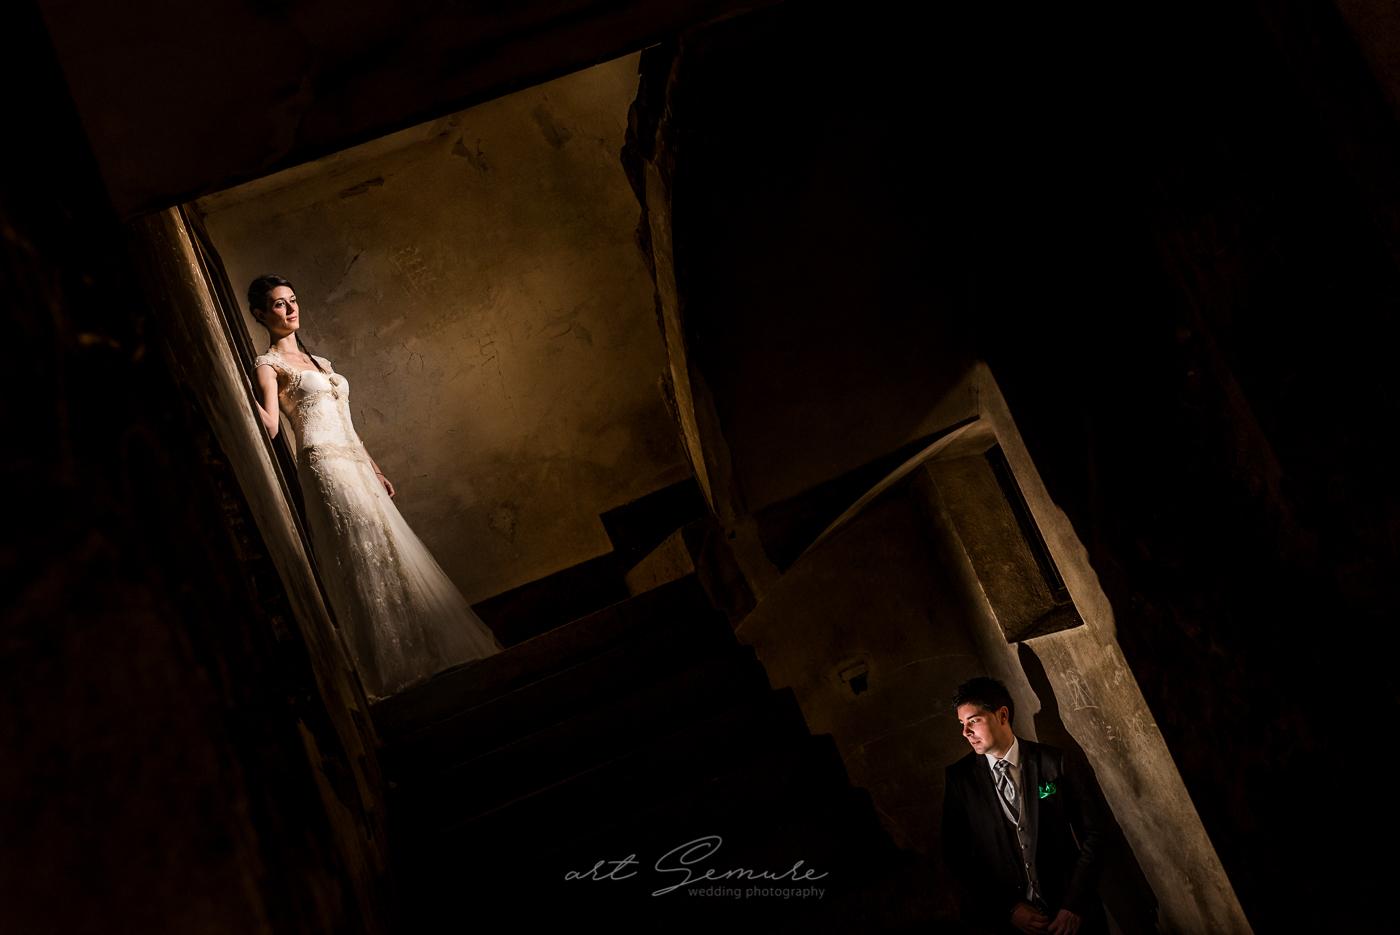 fotografo boda emotiva zamora salto de castro 01_